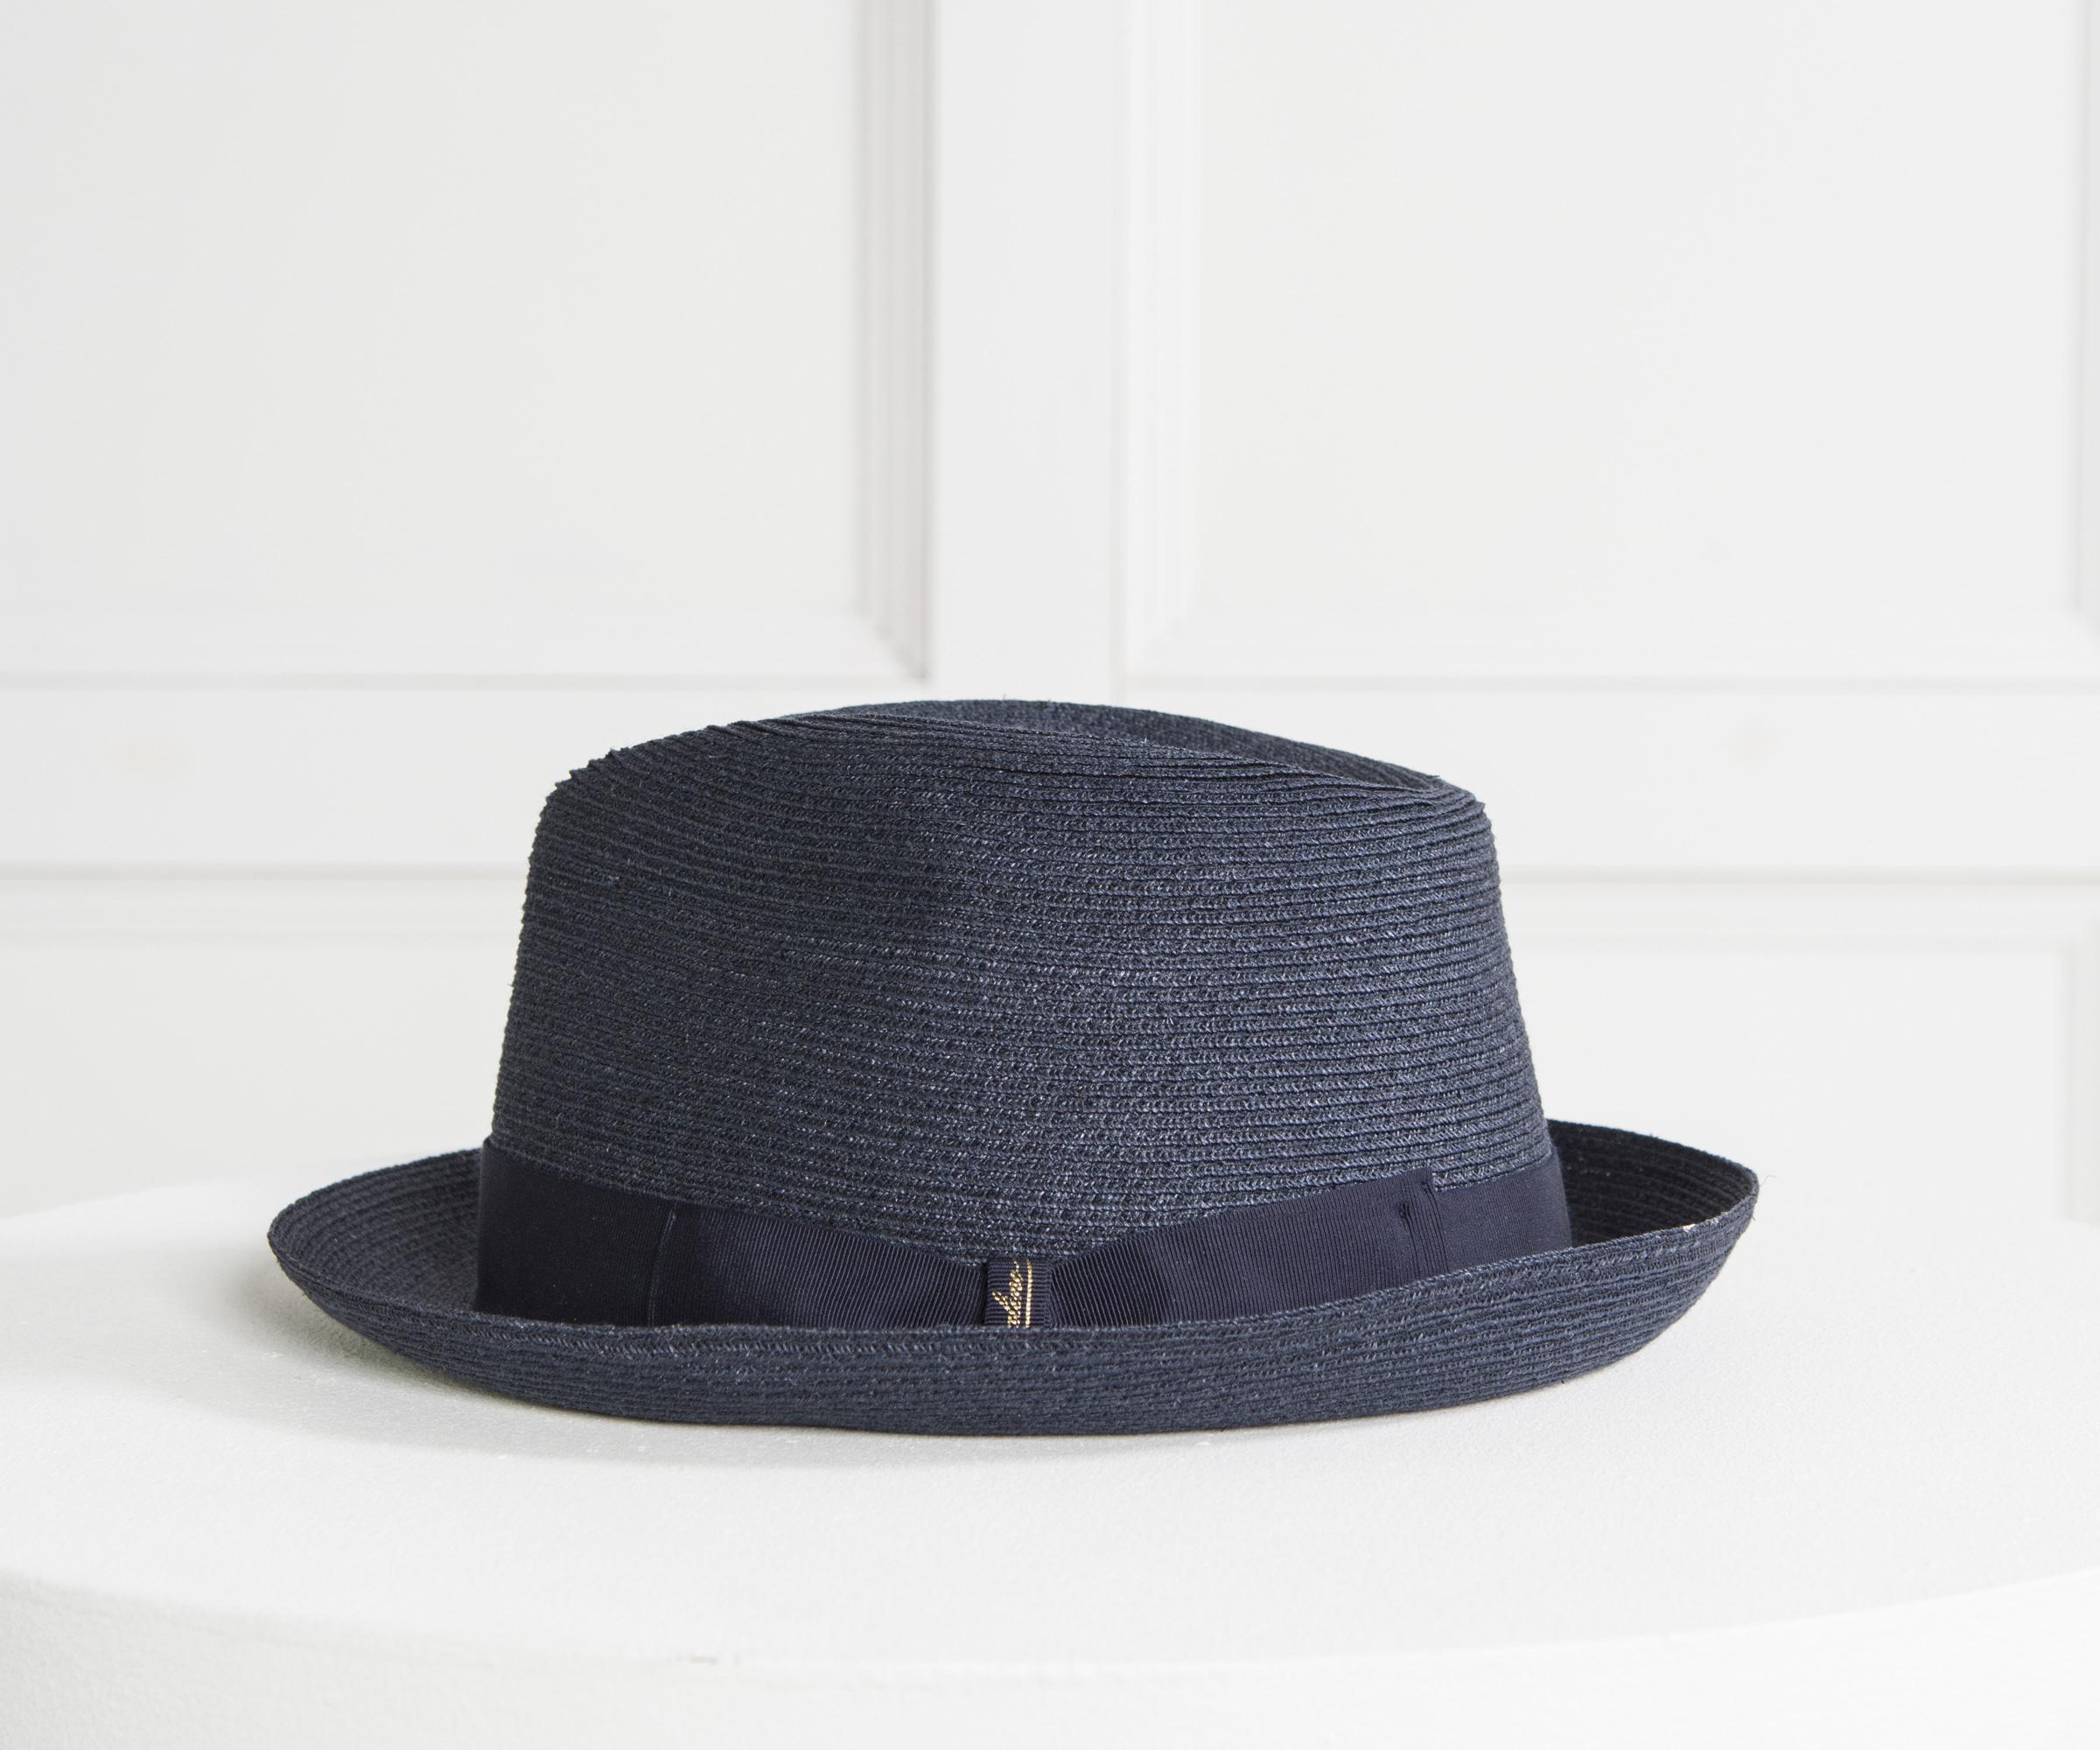 Borsalino  1107  Hemp Trilby Hat Navy in Blue for Men - Lyst bf8a6ec64ae6